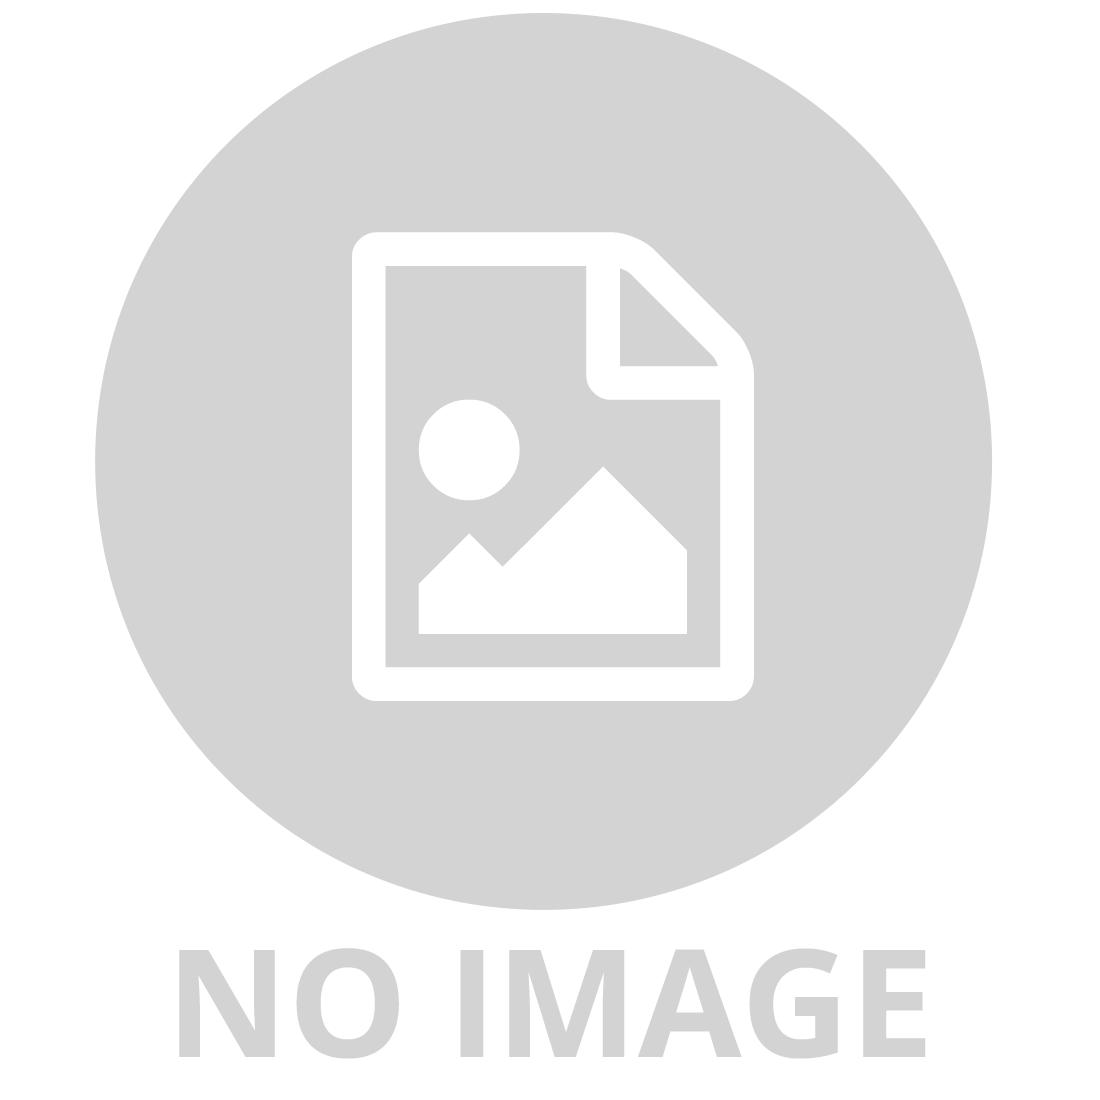 RAVENSBURGER 300PC JIGSAW PUZZLE POLAR ANIMALS GATHERING